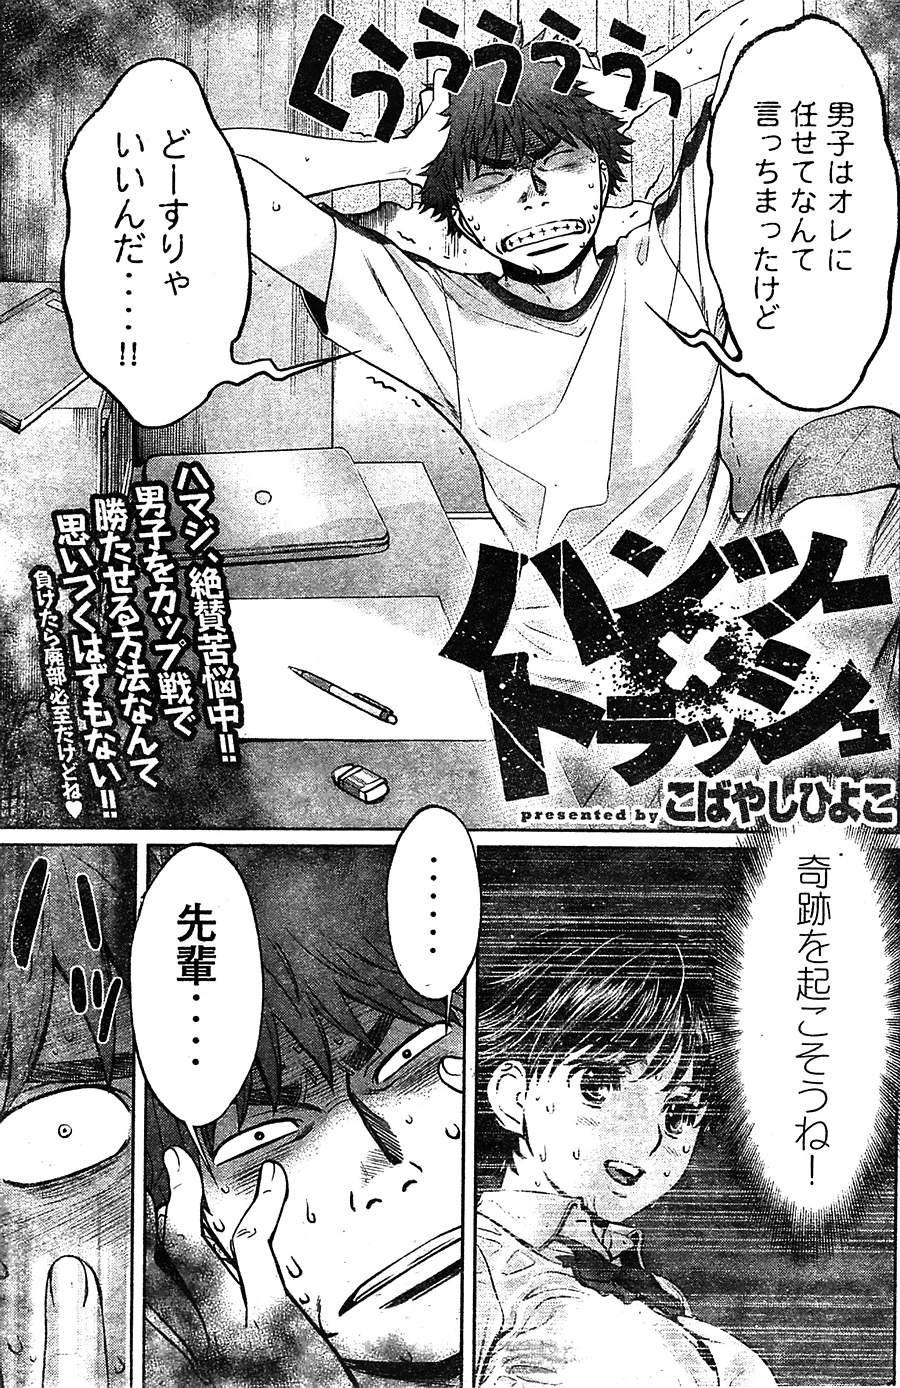 Hantsu_x_Trash Chapter 93 Page 1